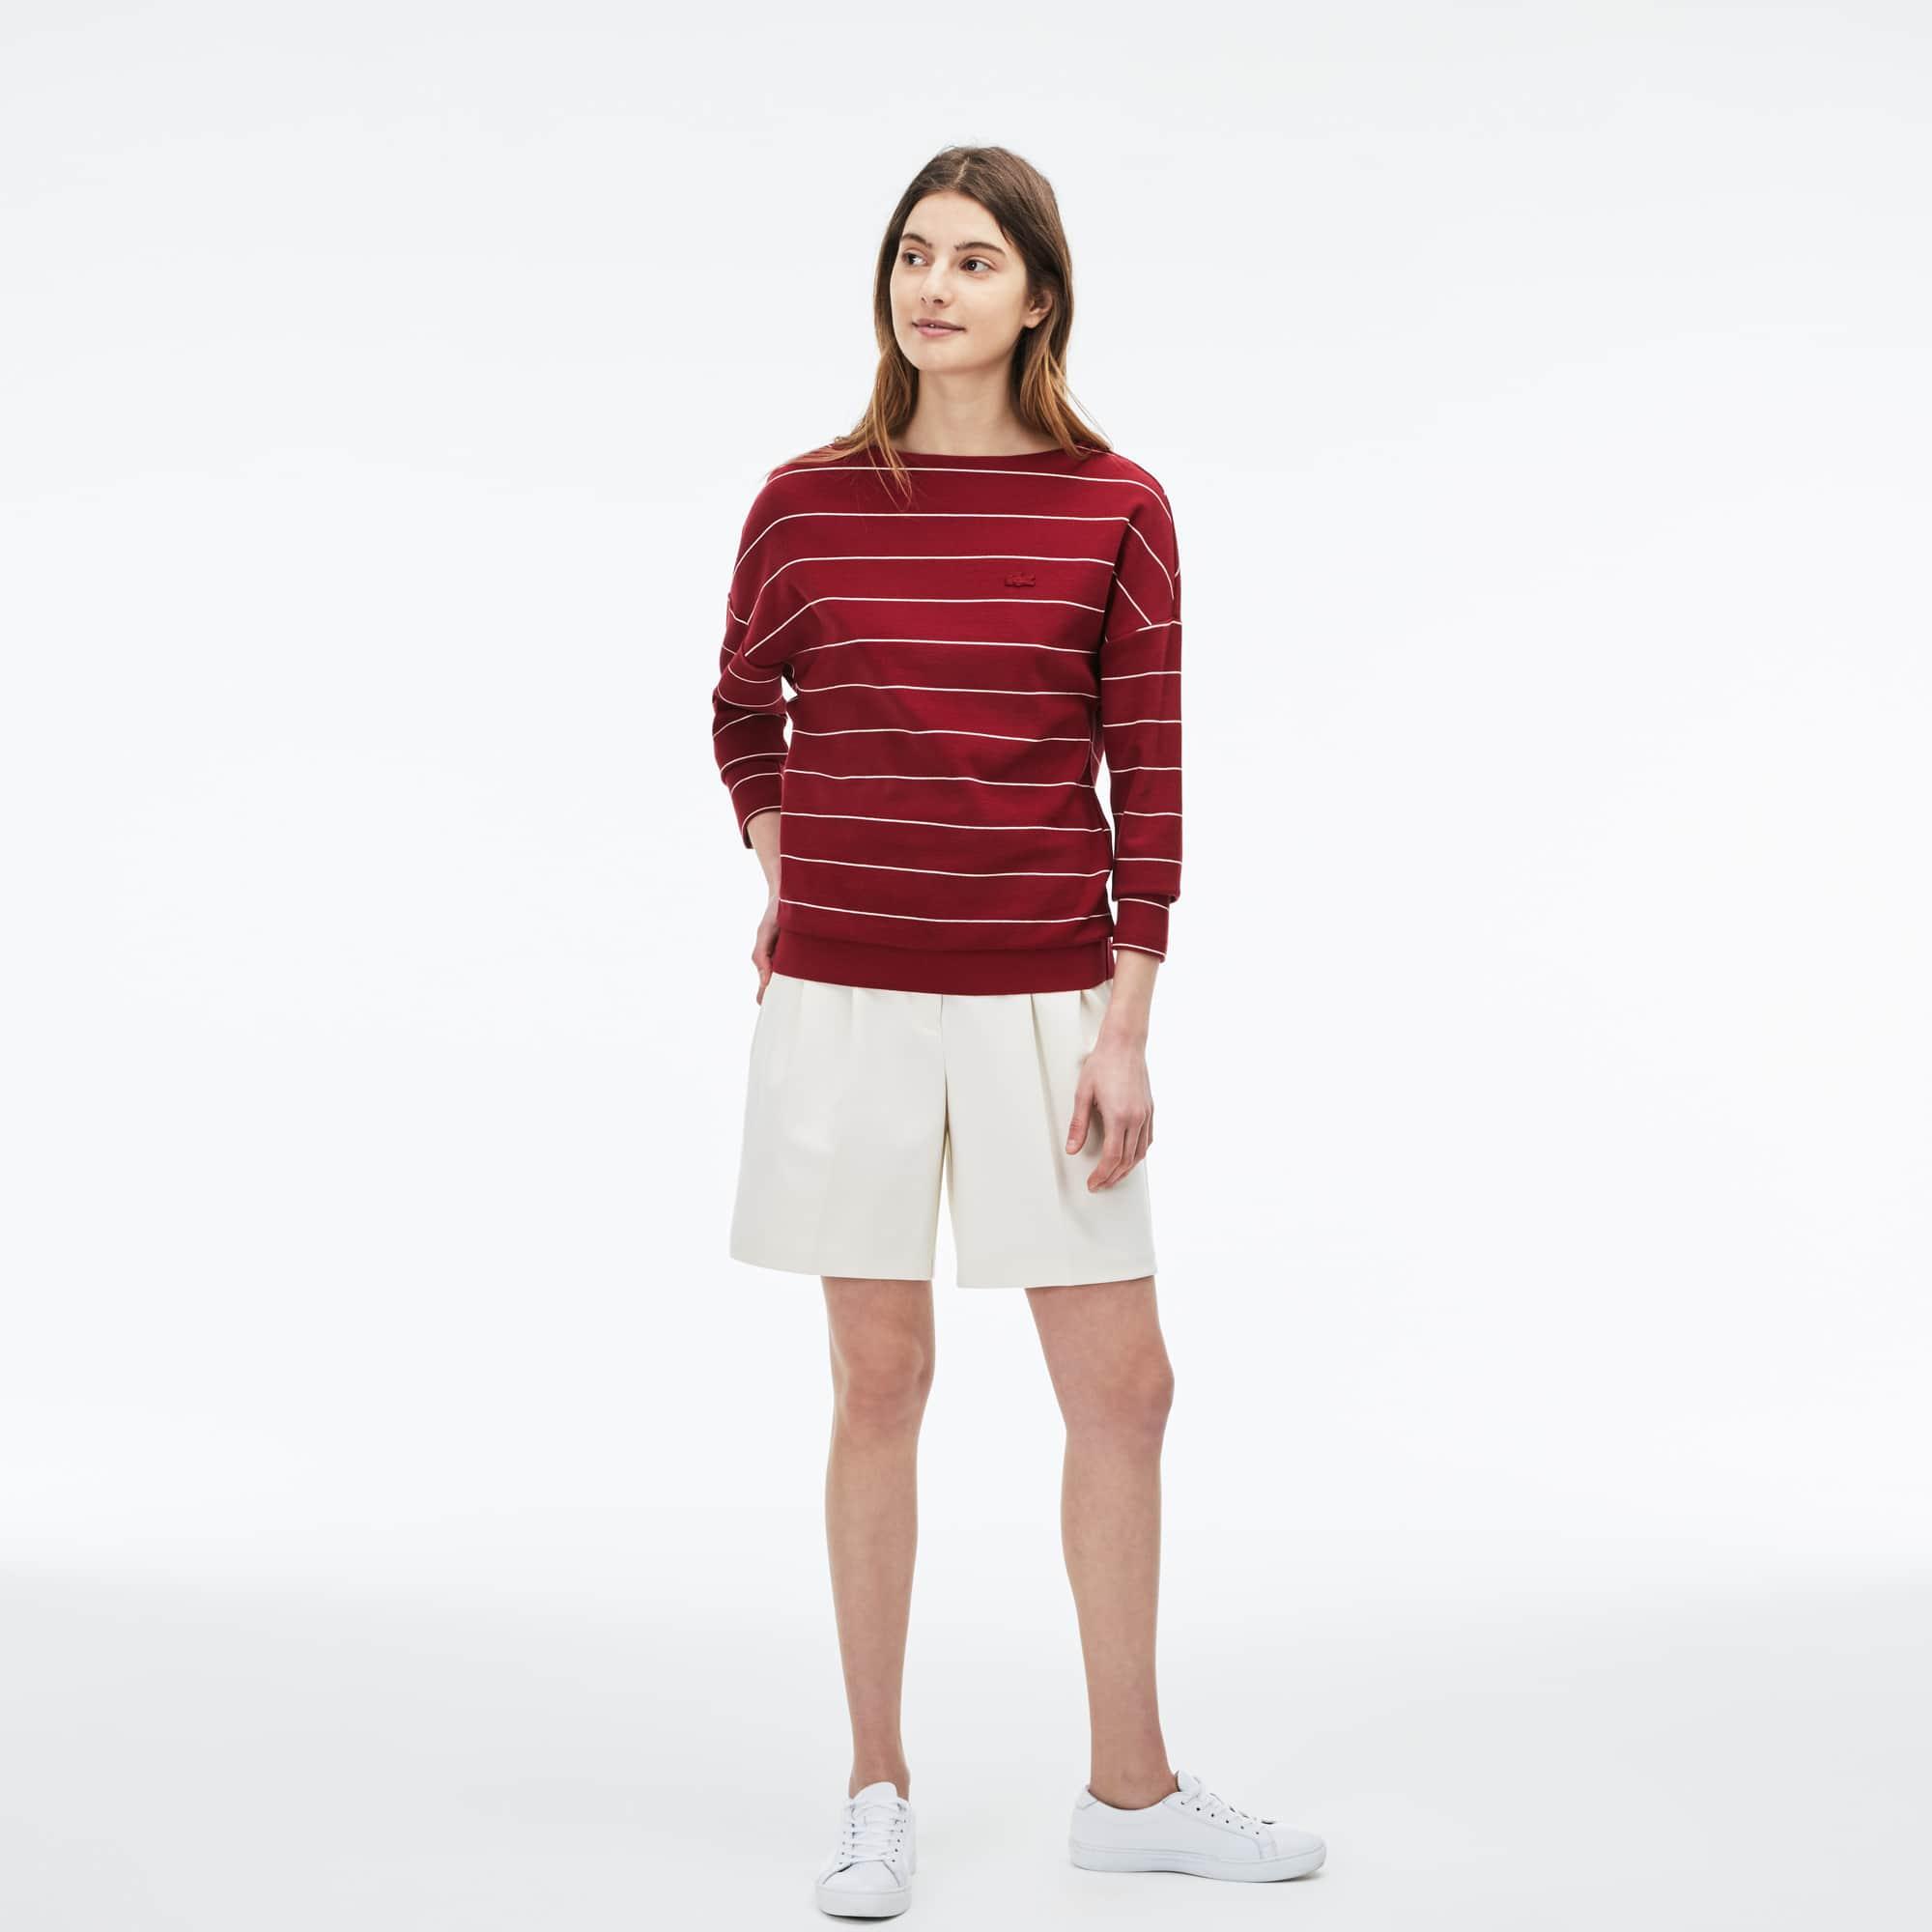 Women's Boat Neck Striped Cotton Honeycomb Sweatshirt